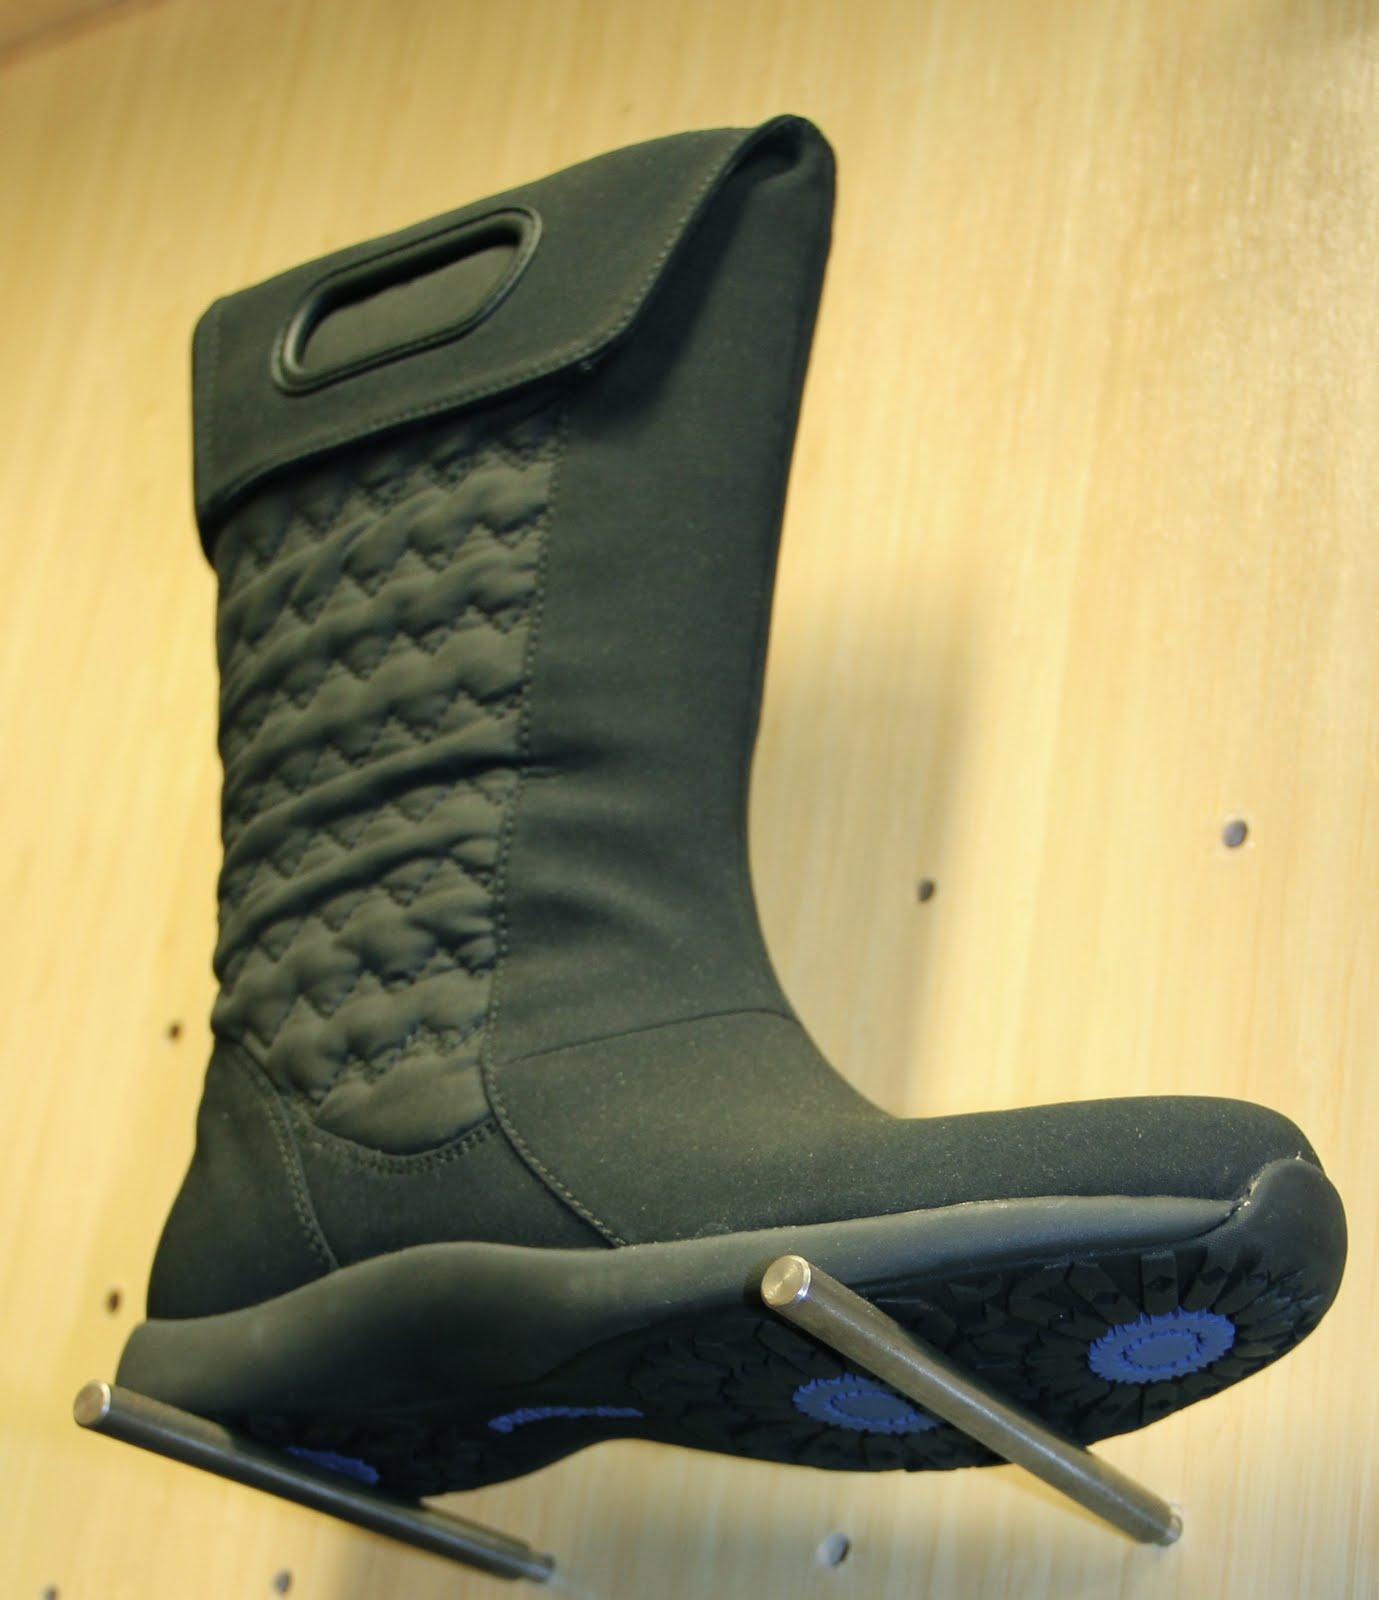 Recycled Nylon Footwear 31